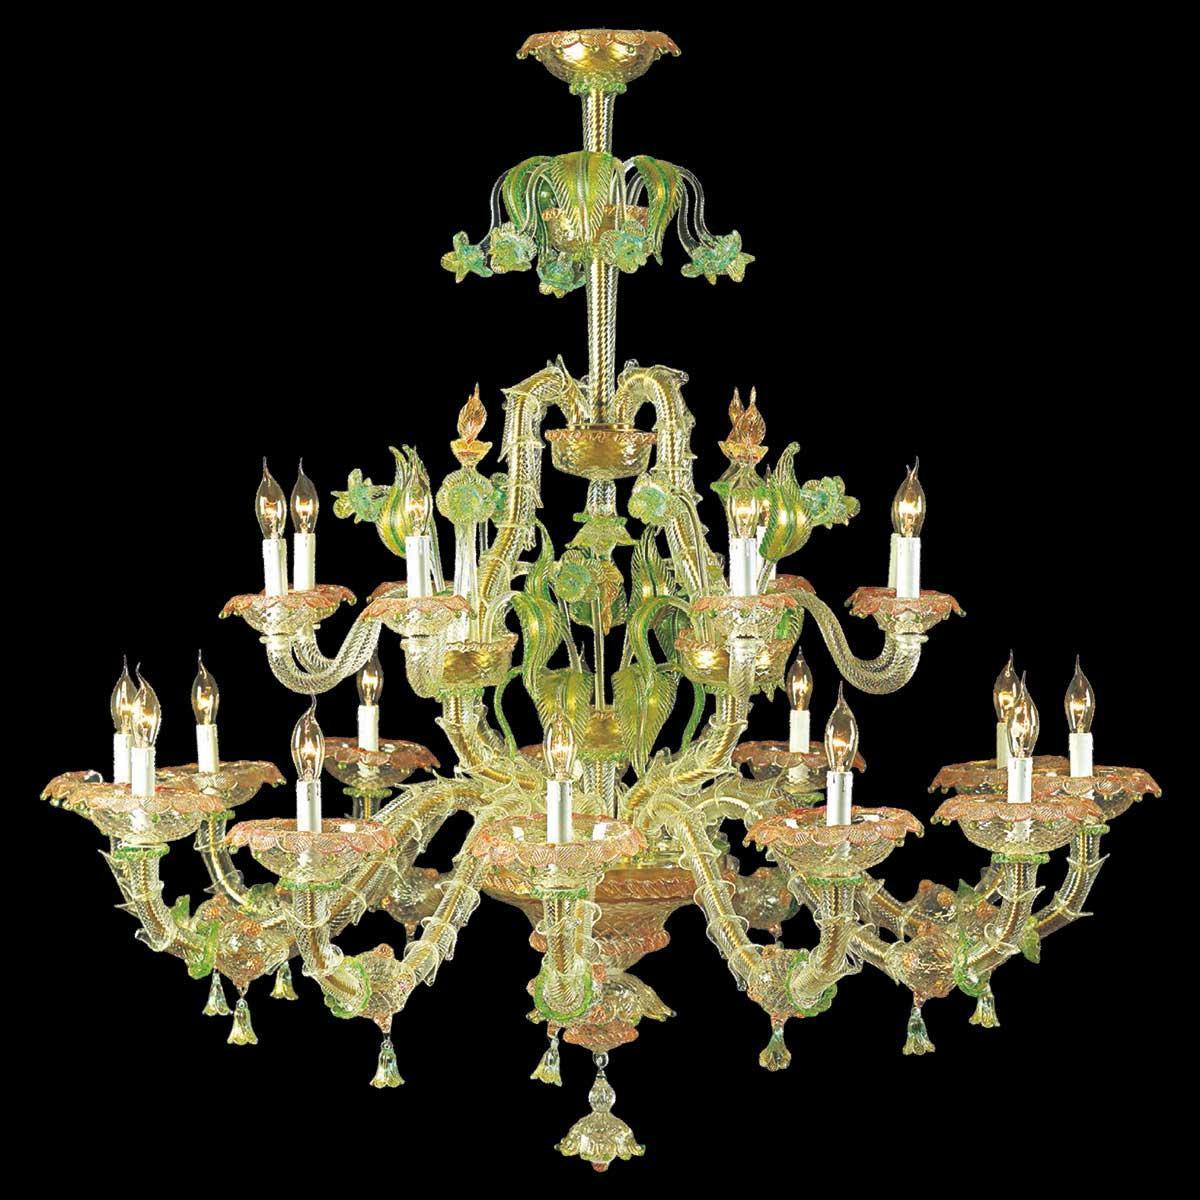 """Cinzia"" Murano glas Kronleuchter - 12+8 flammig - transparent, multicolor und gold"